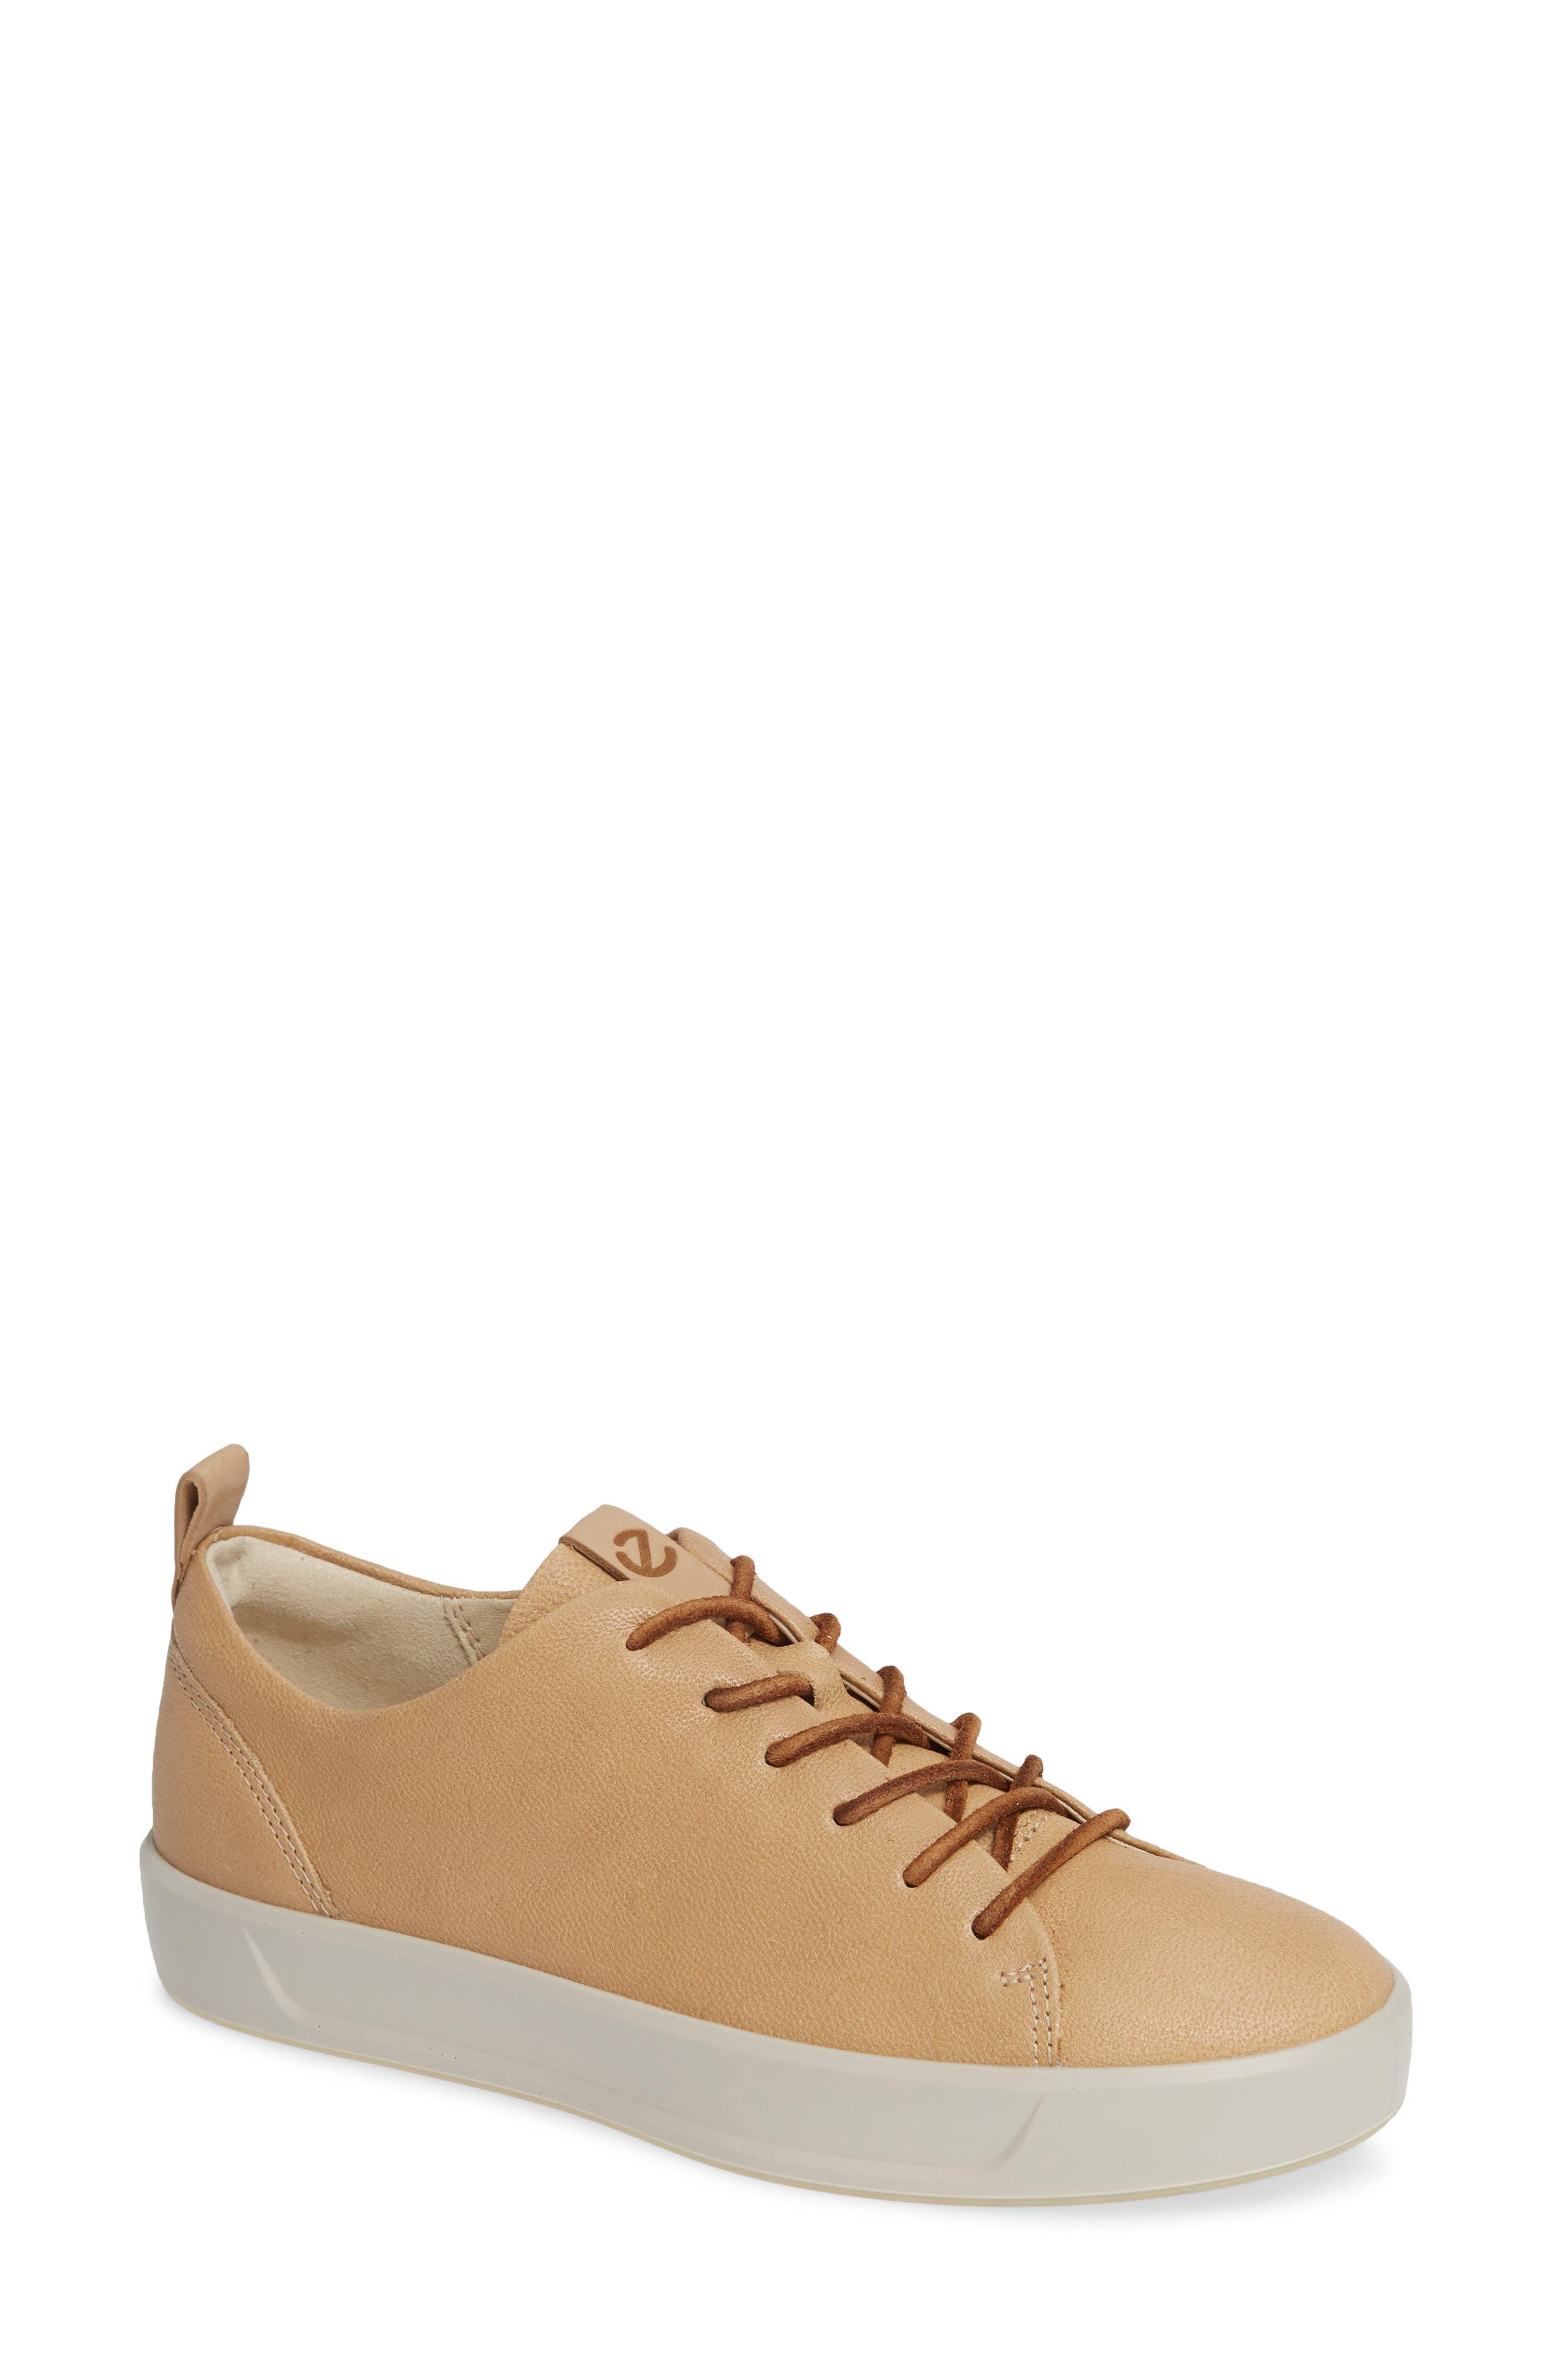 ECCO Soft 8 Sneaker, Main, color, POWDER LEATHER